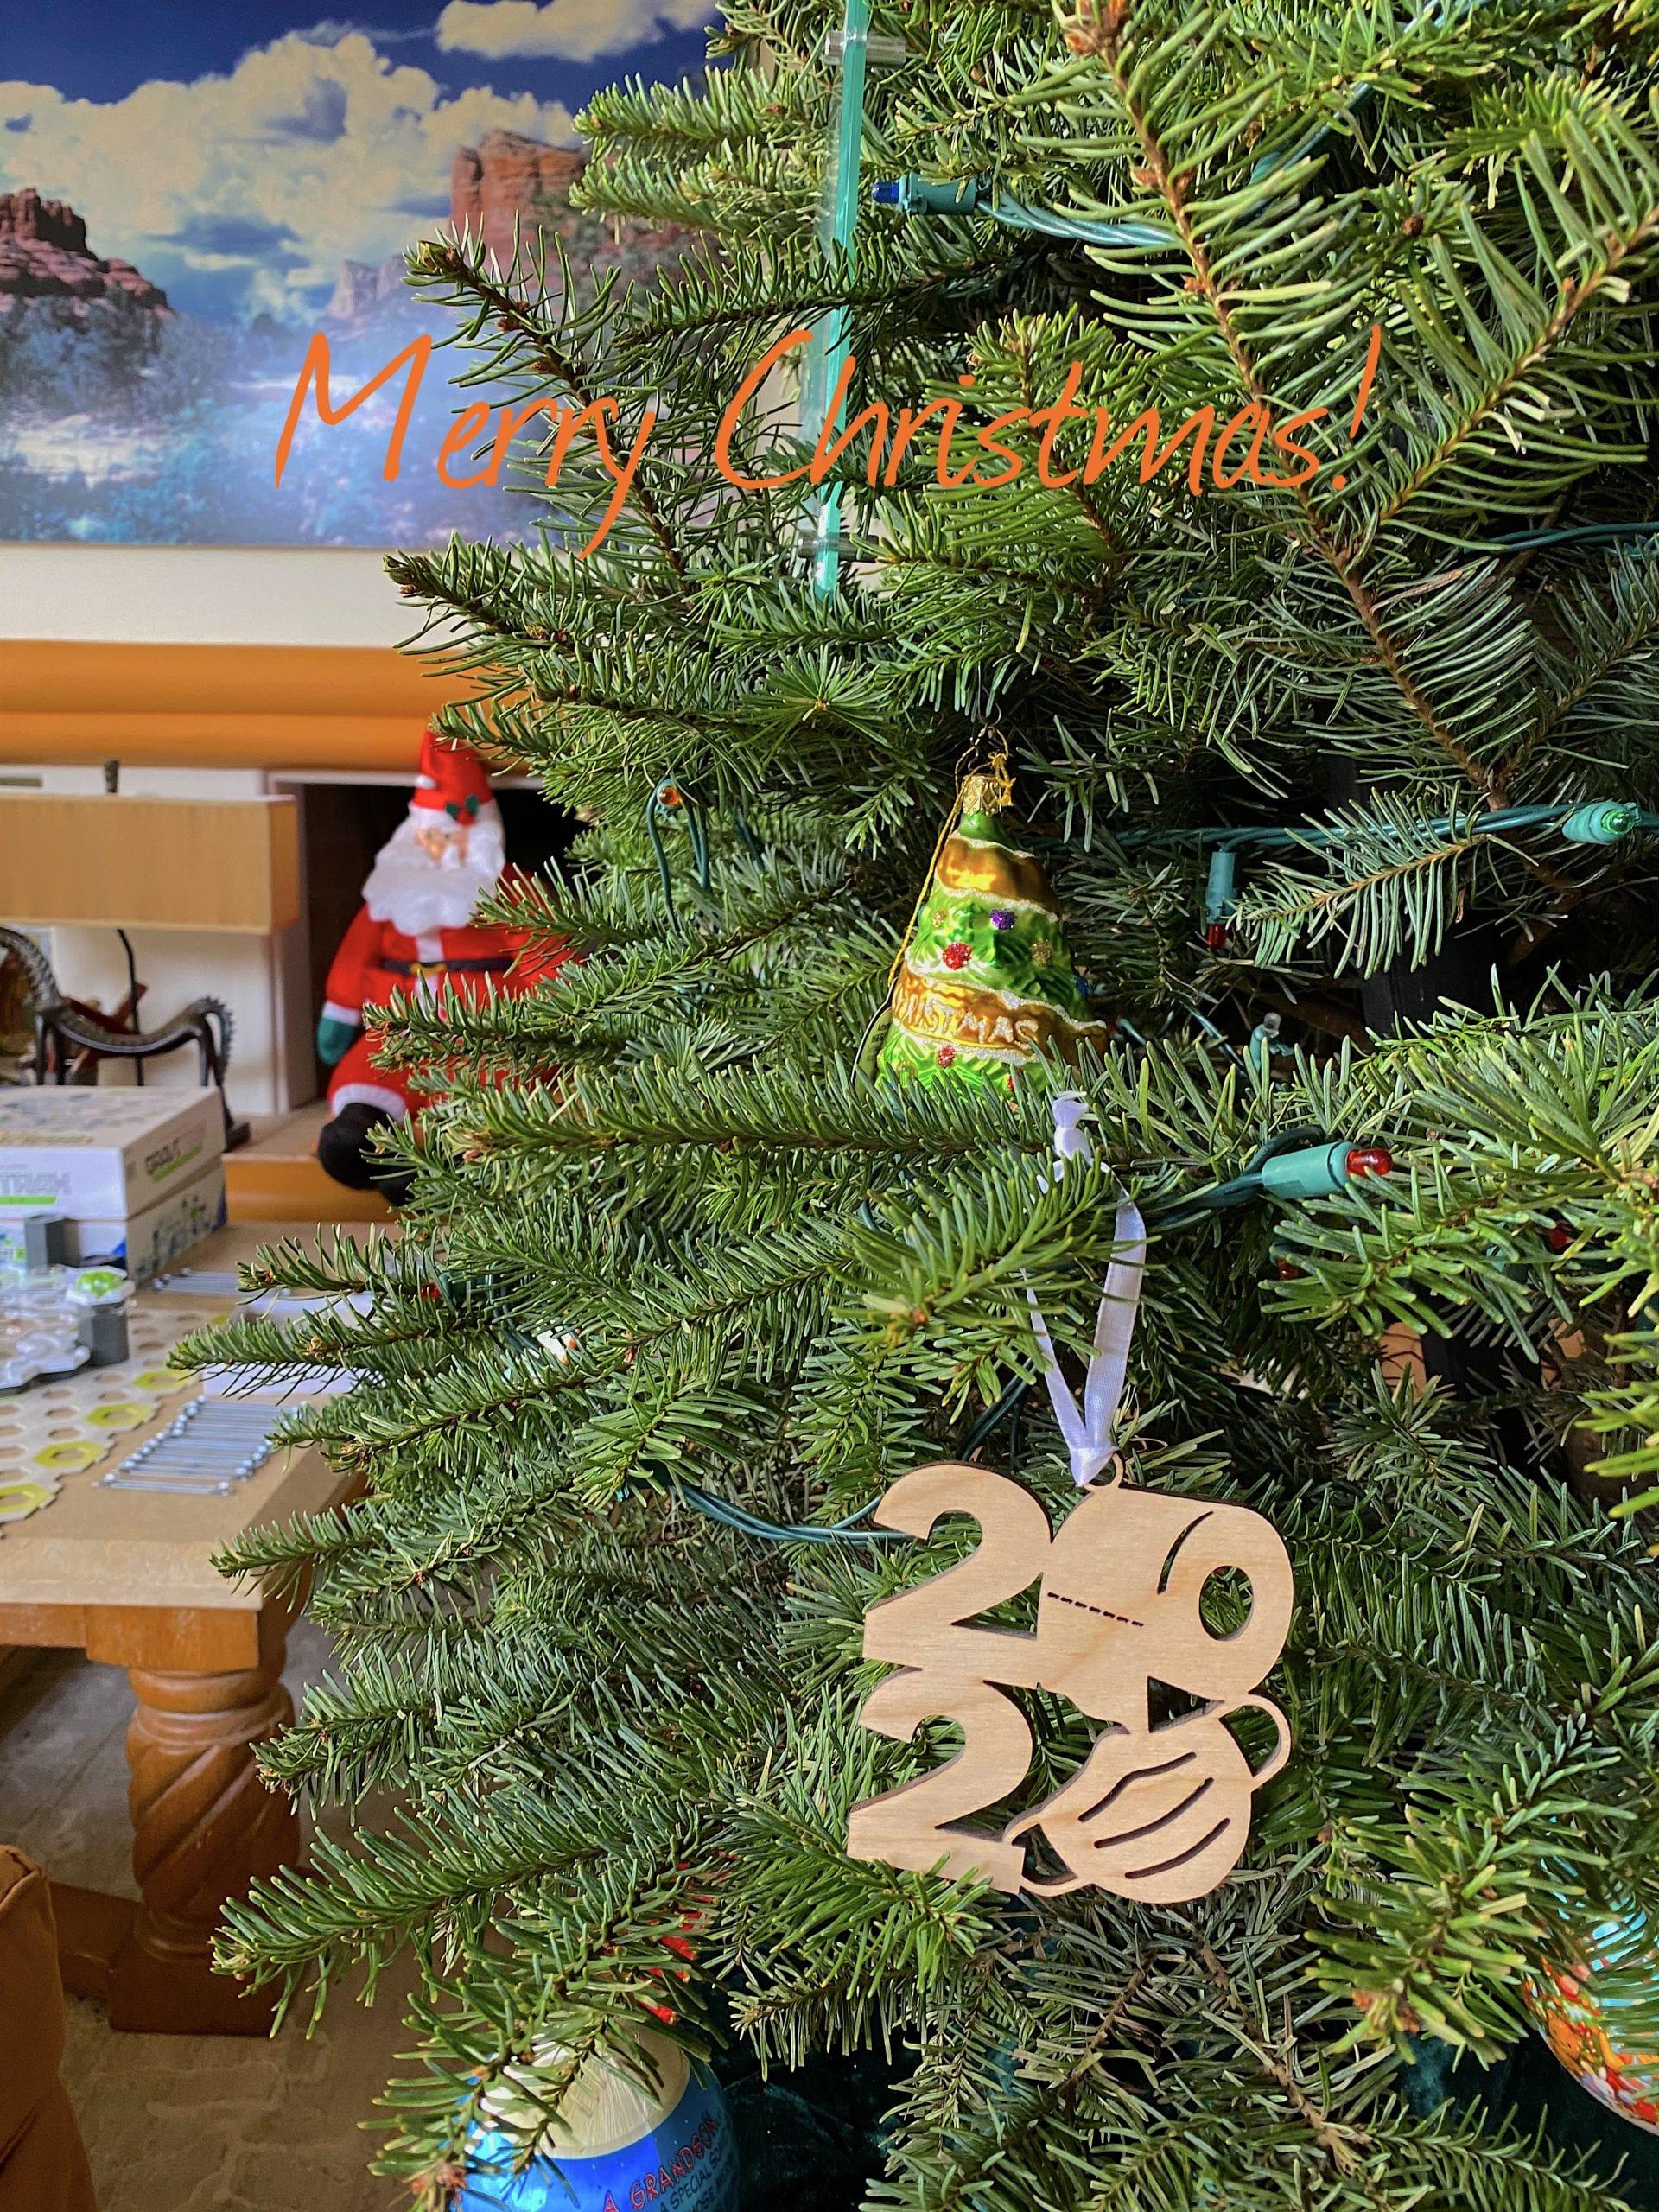 Happy 2020 Christmas!